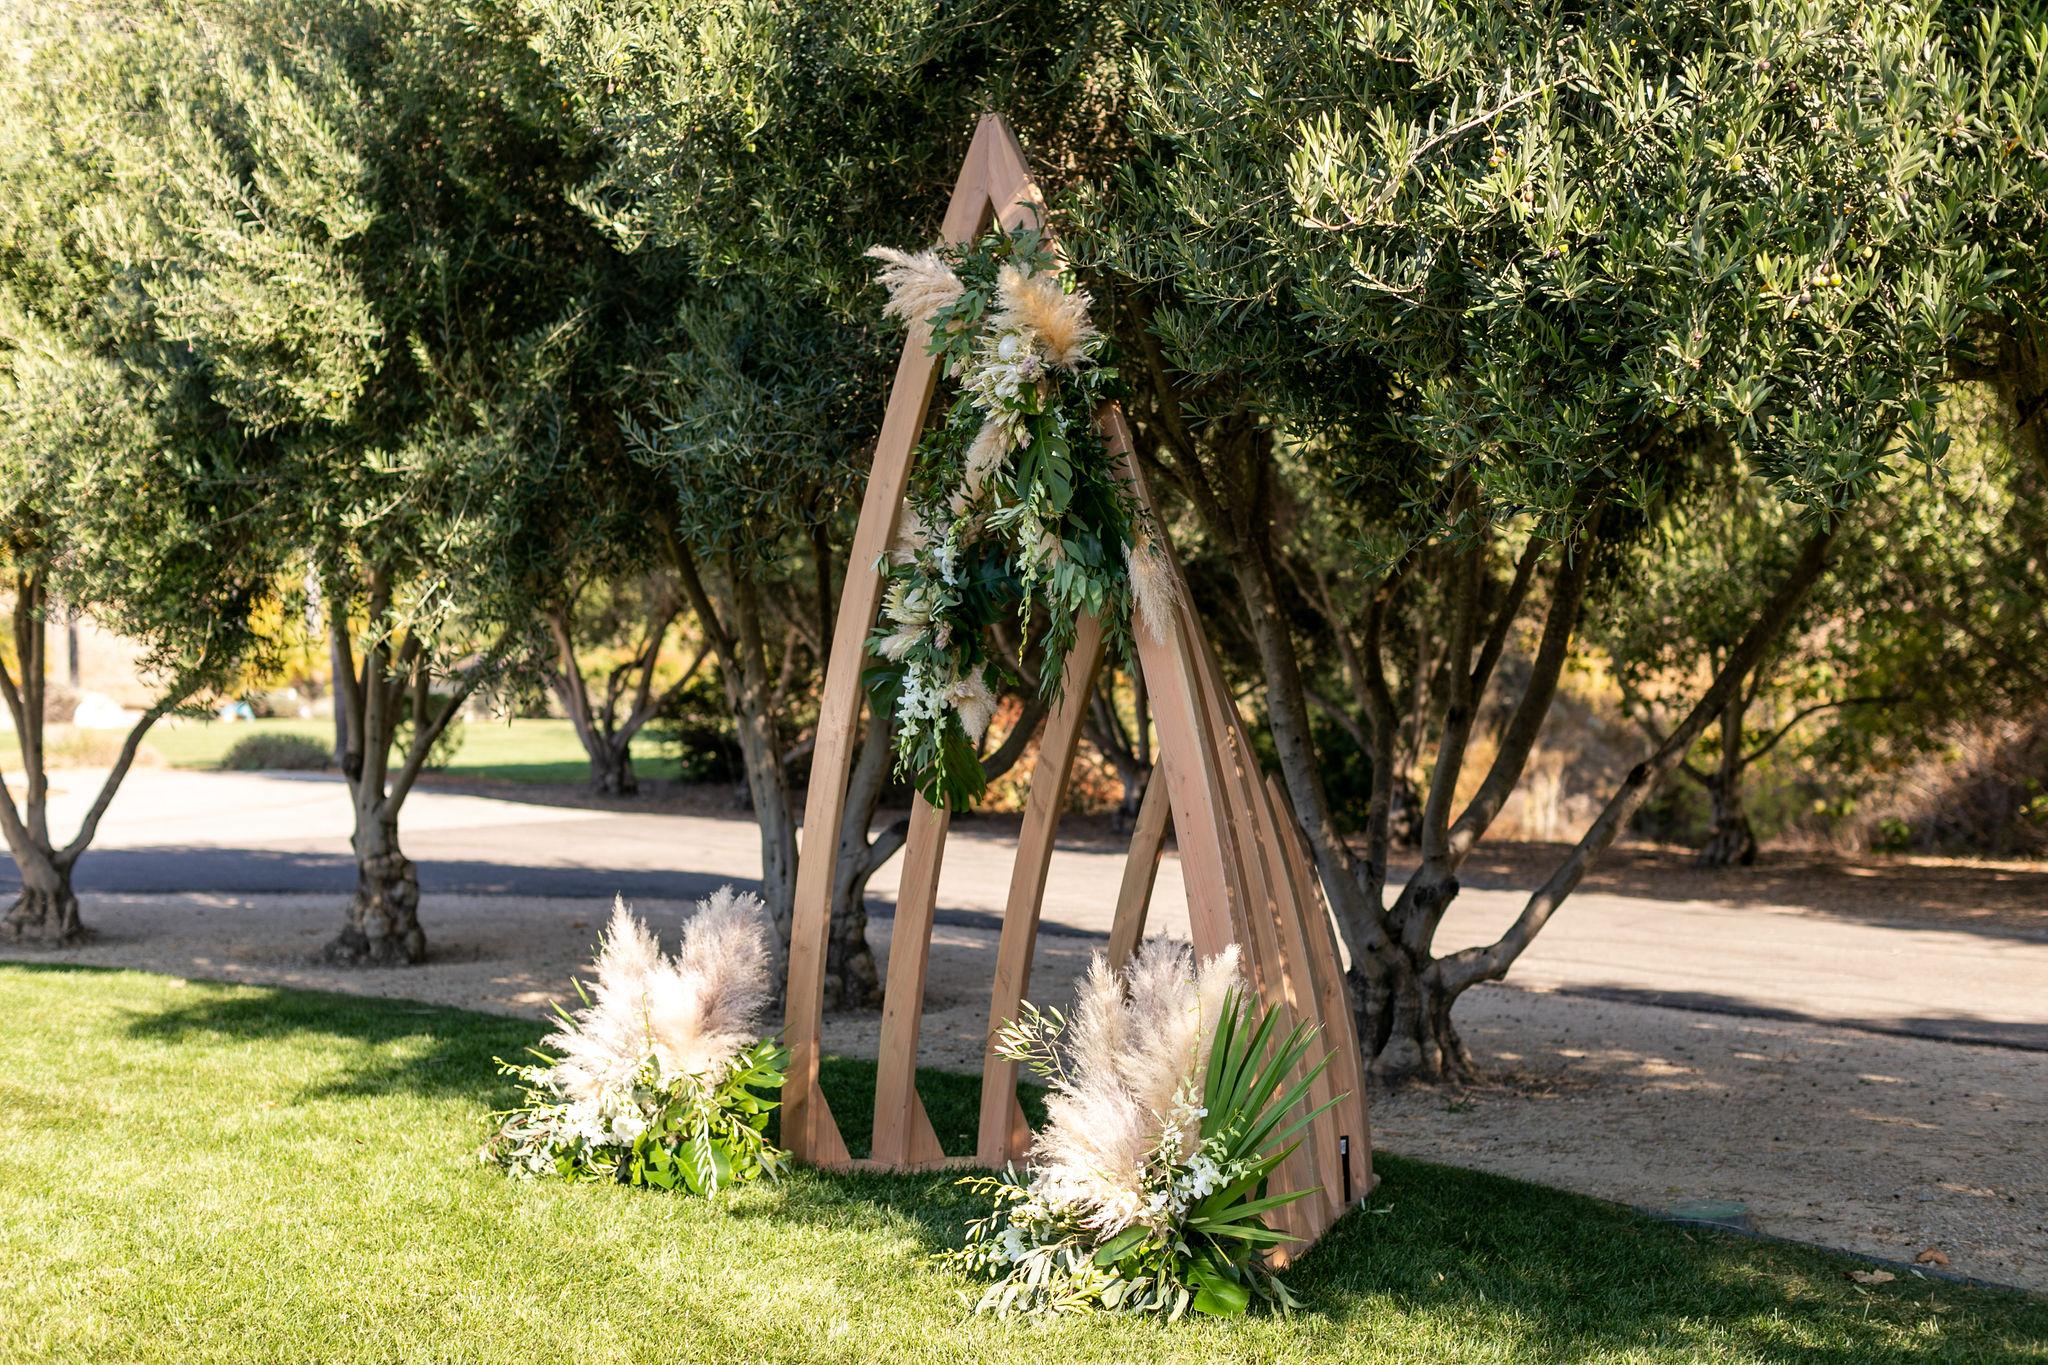 cameron_ingalls-higuera_ranch-silvera-0330.jpg